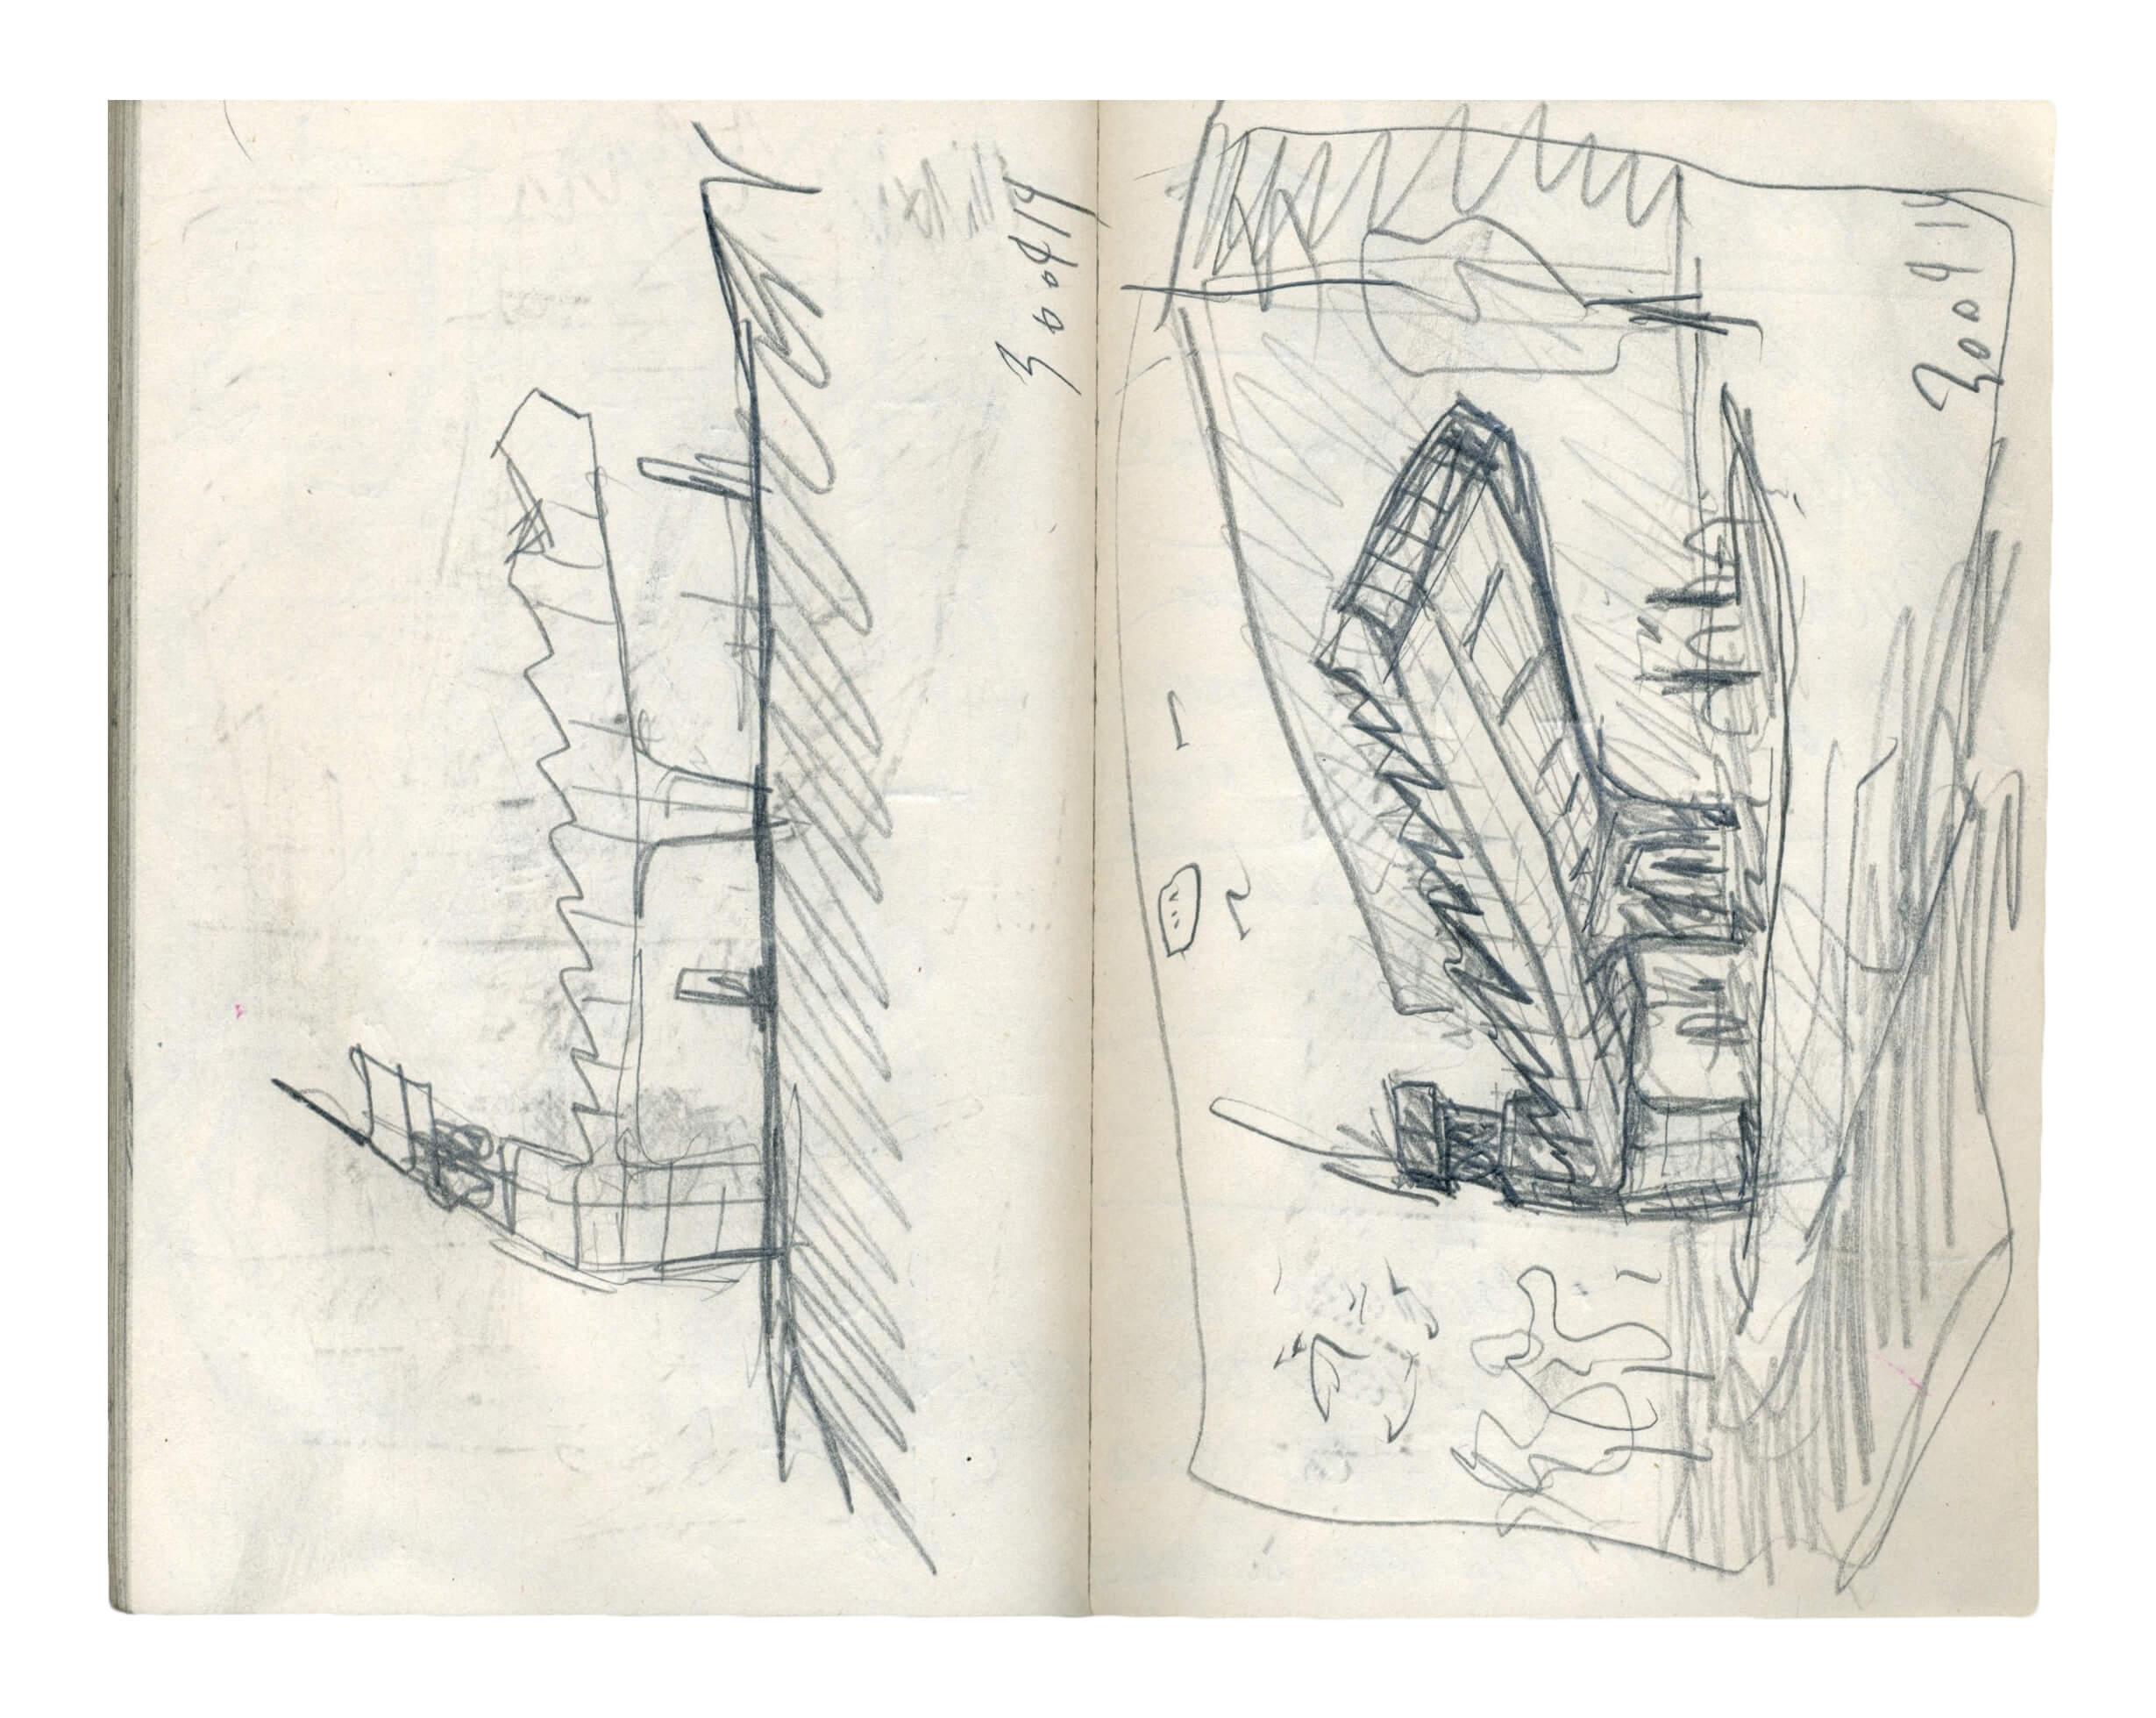 Seite 111-112